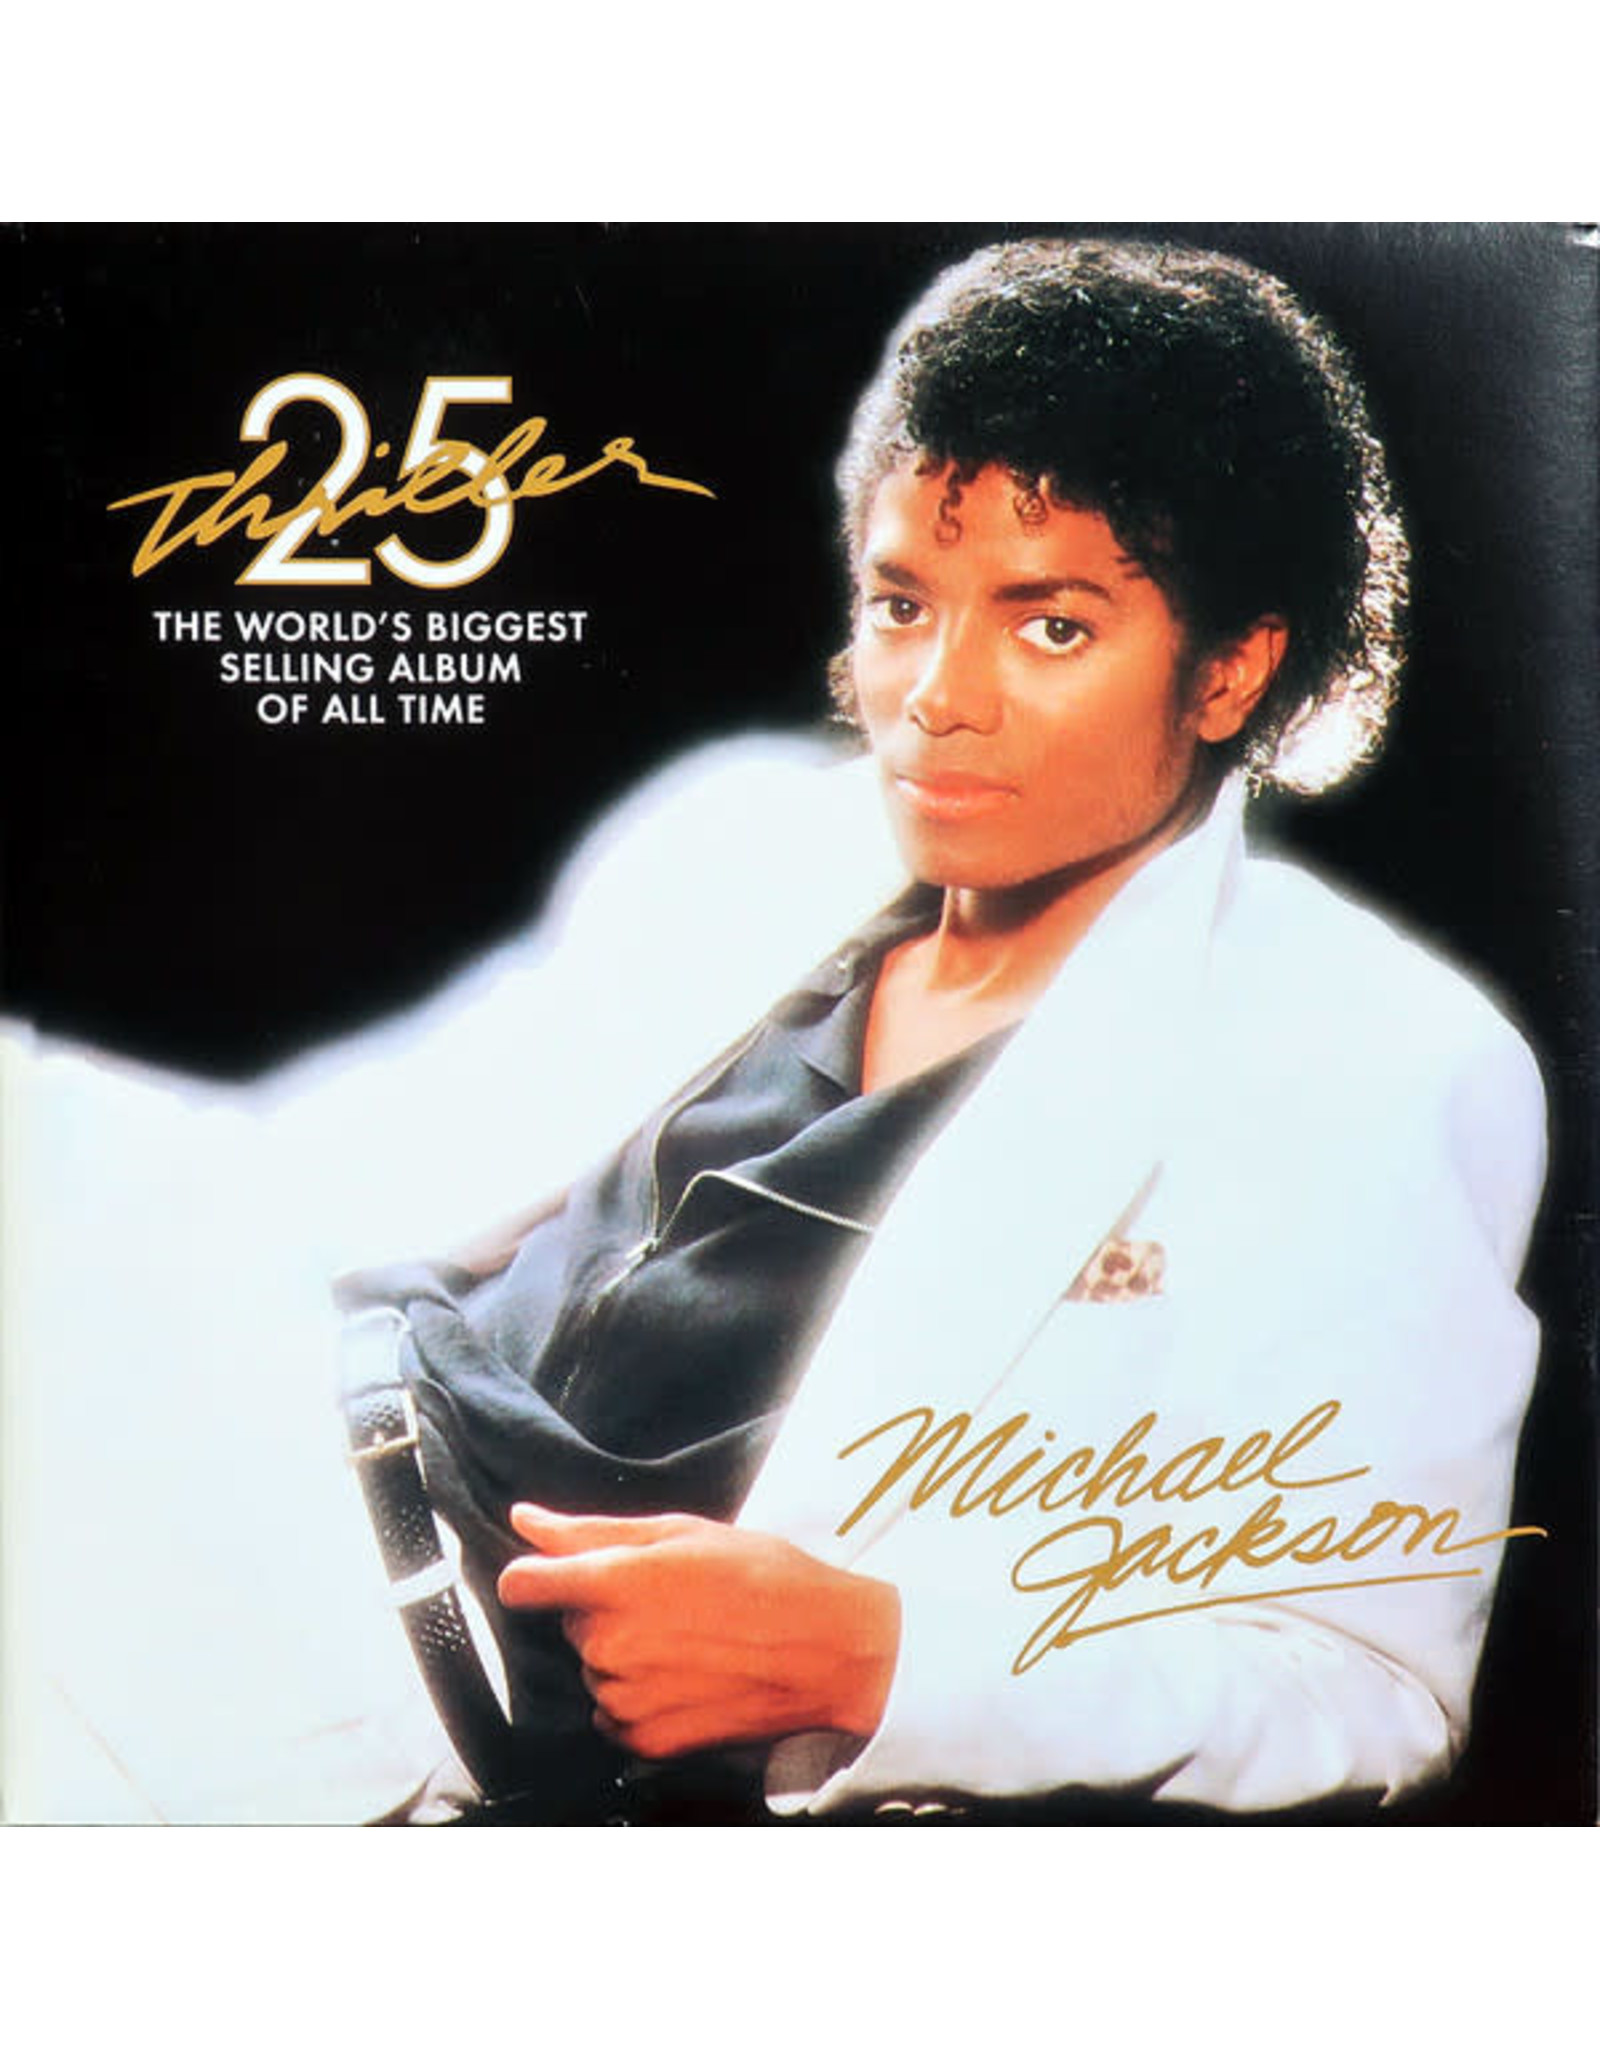 Jackson, Michael - Thriller (25th Anniversary) 2LP